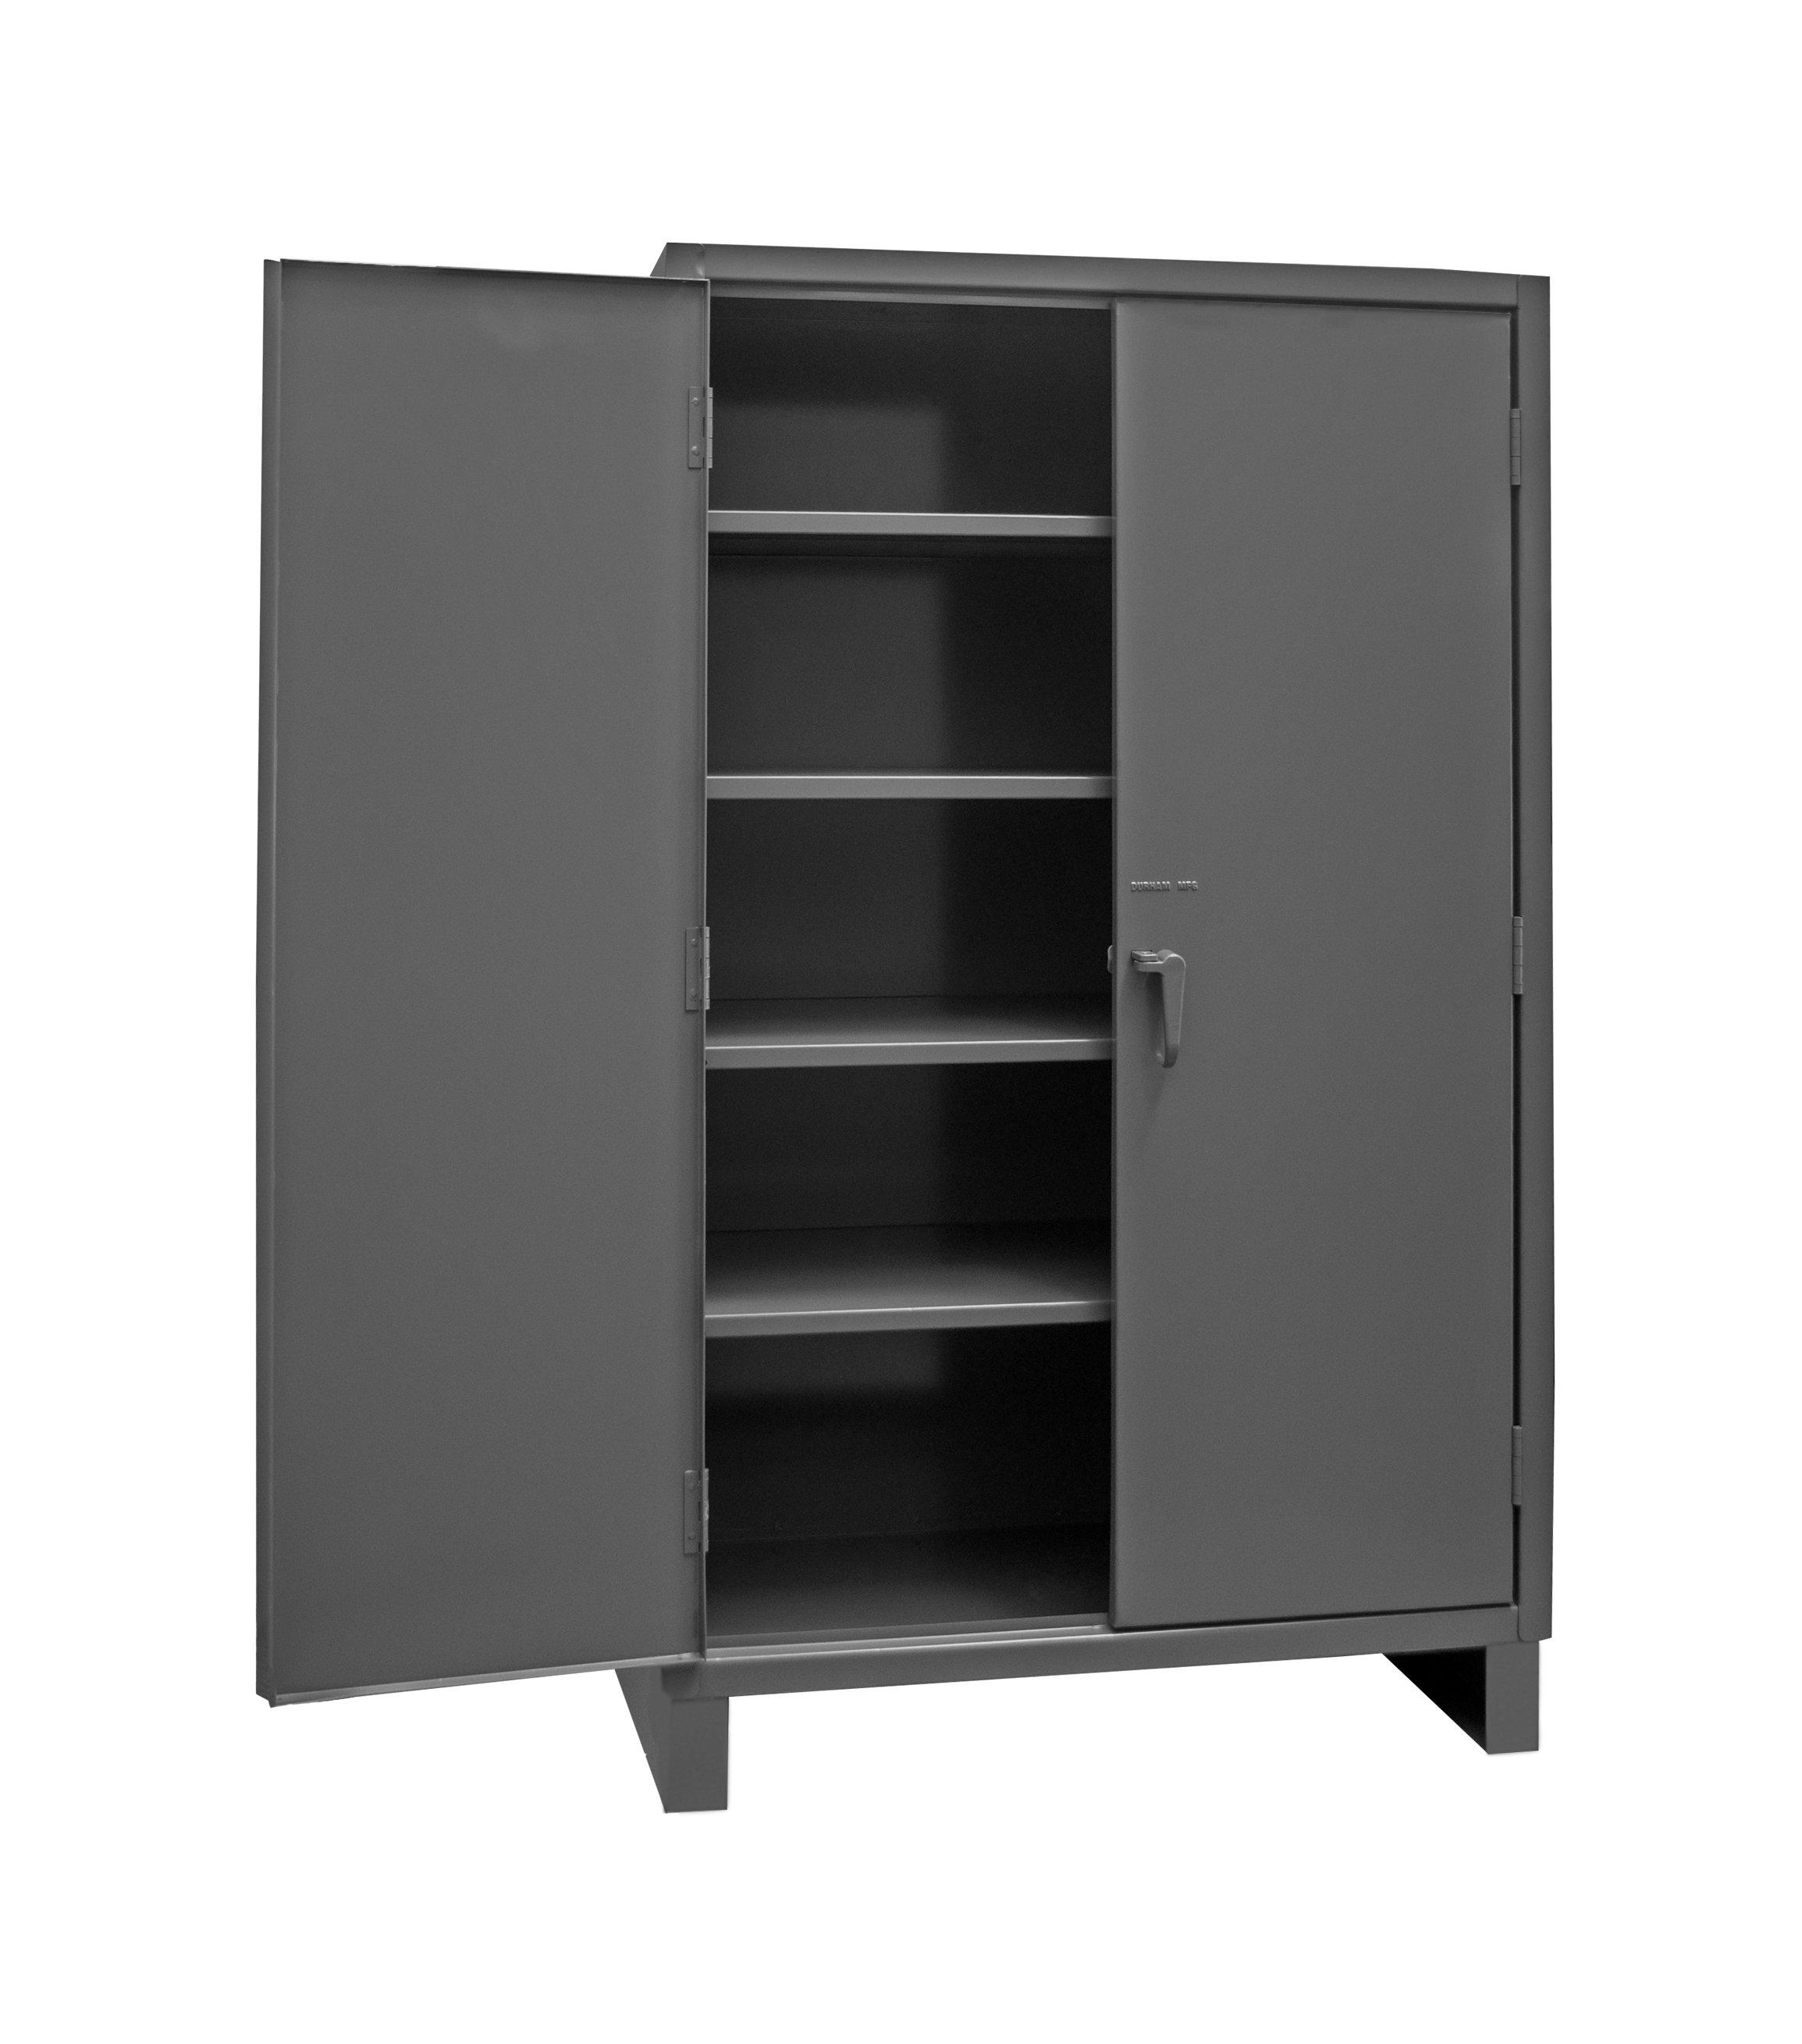 Durham Manufacturing 72 H X 48 W X 24 D Recessed Door Style